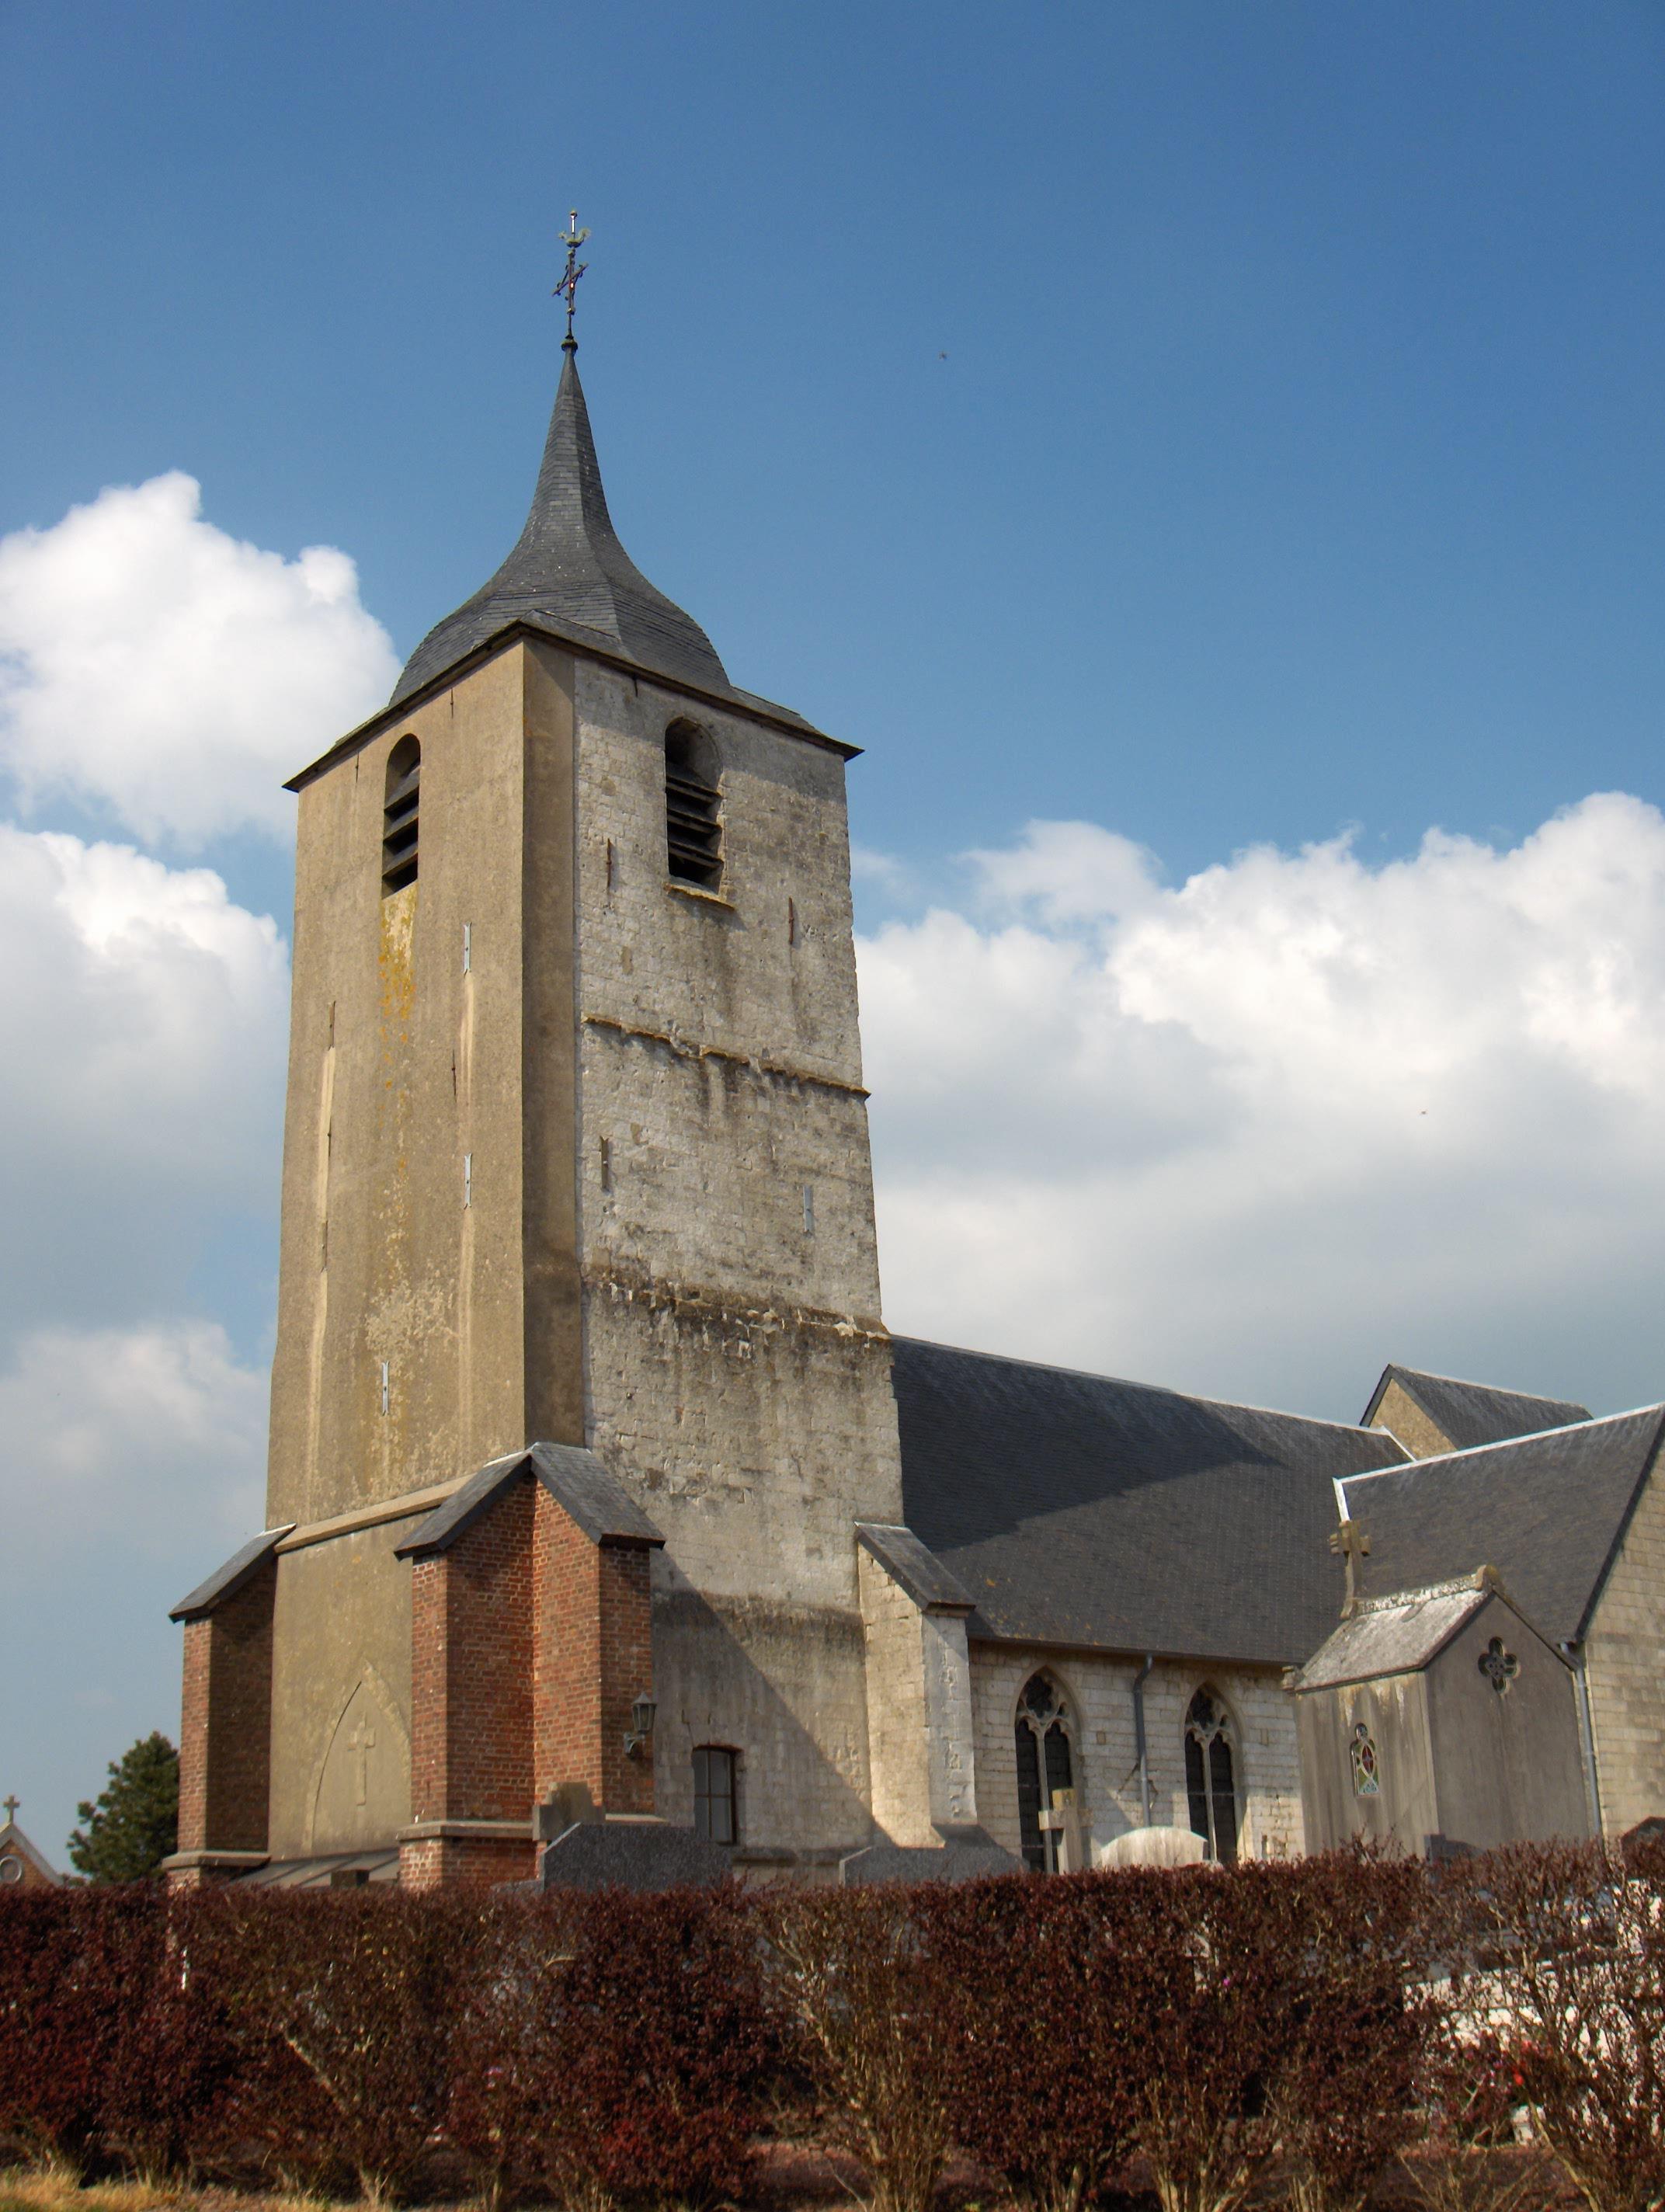 Campagne-lès-Boulonnais